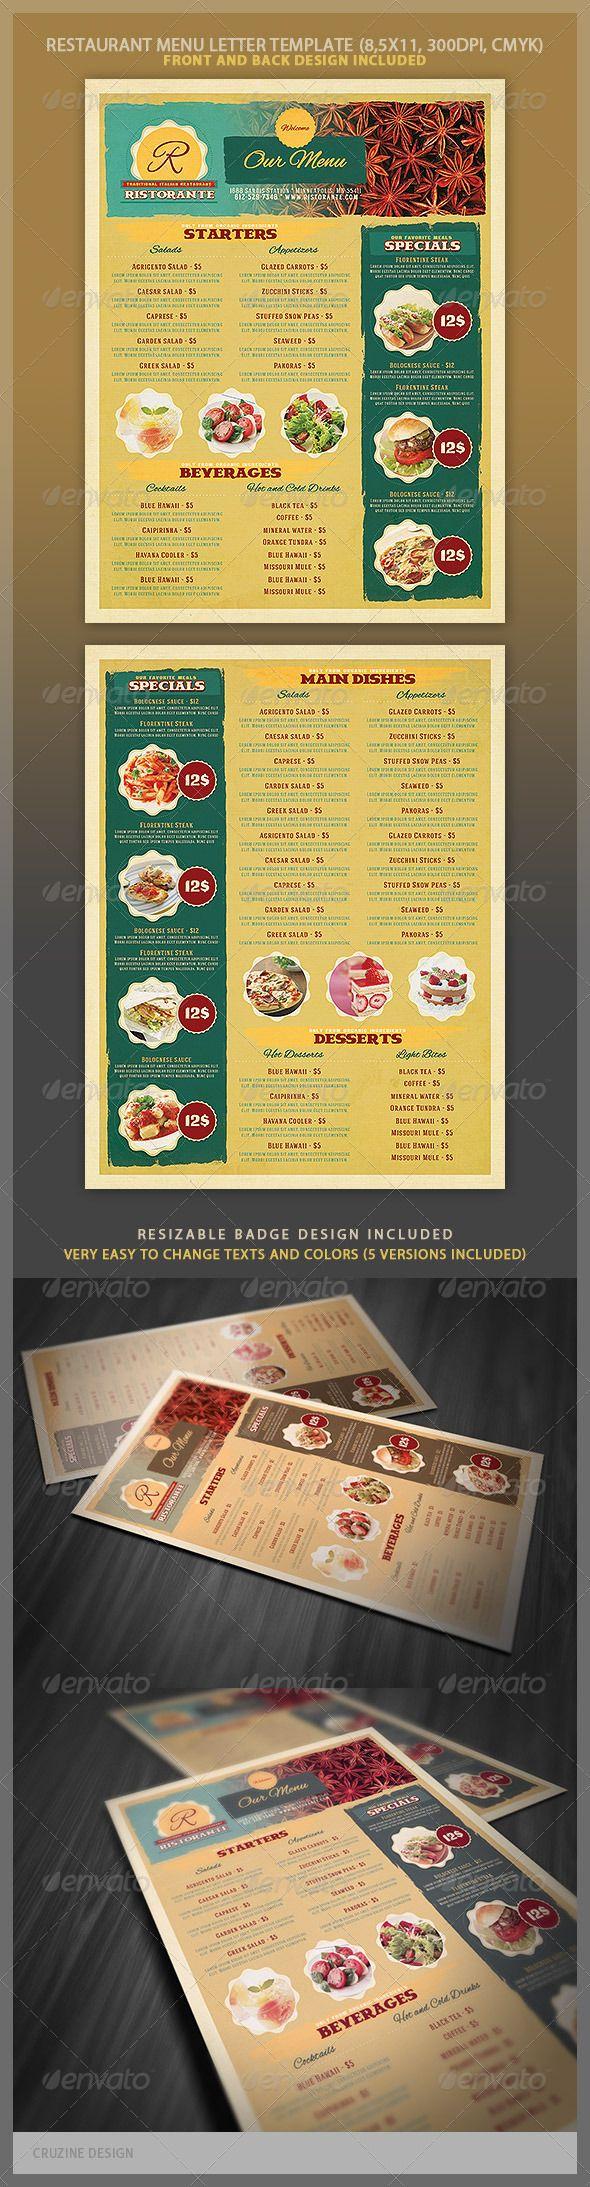 Restaurant Menu Template - http://graphicriver.net/item/restaurant-menu-template/4057527?ref=cruzine